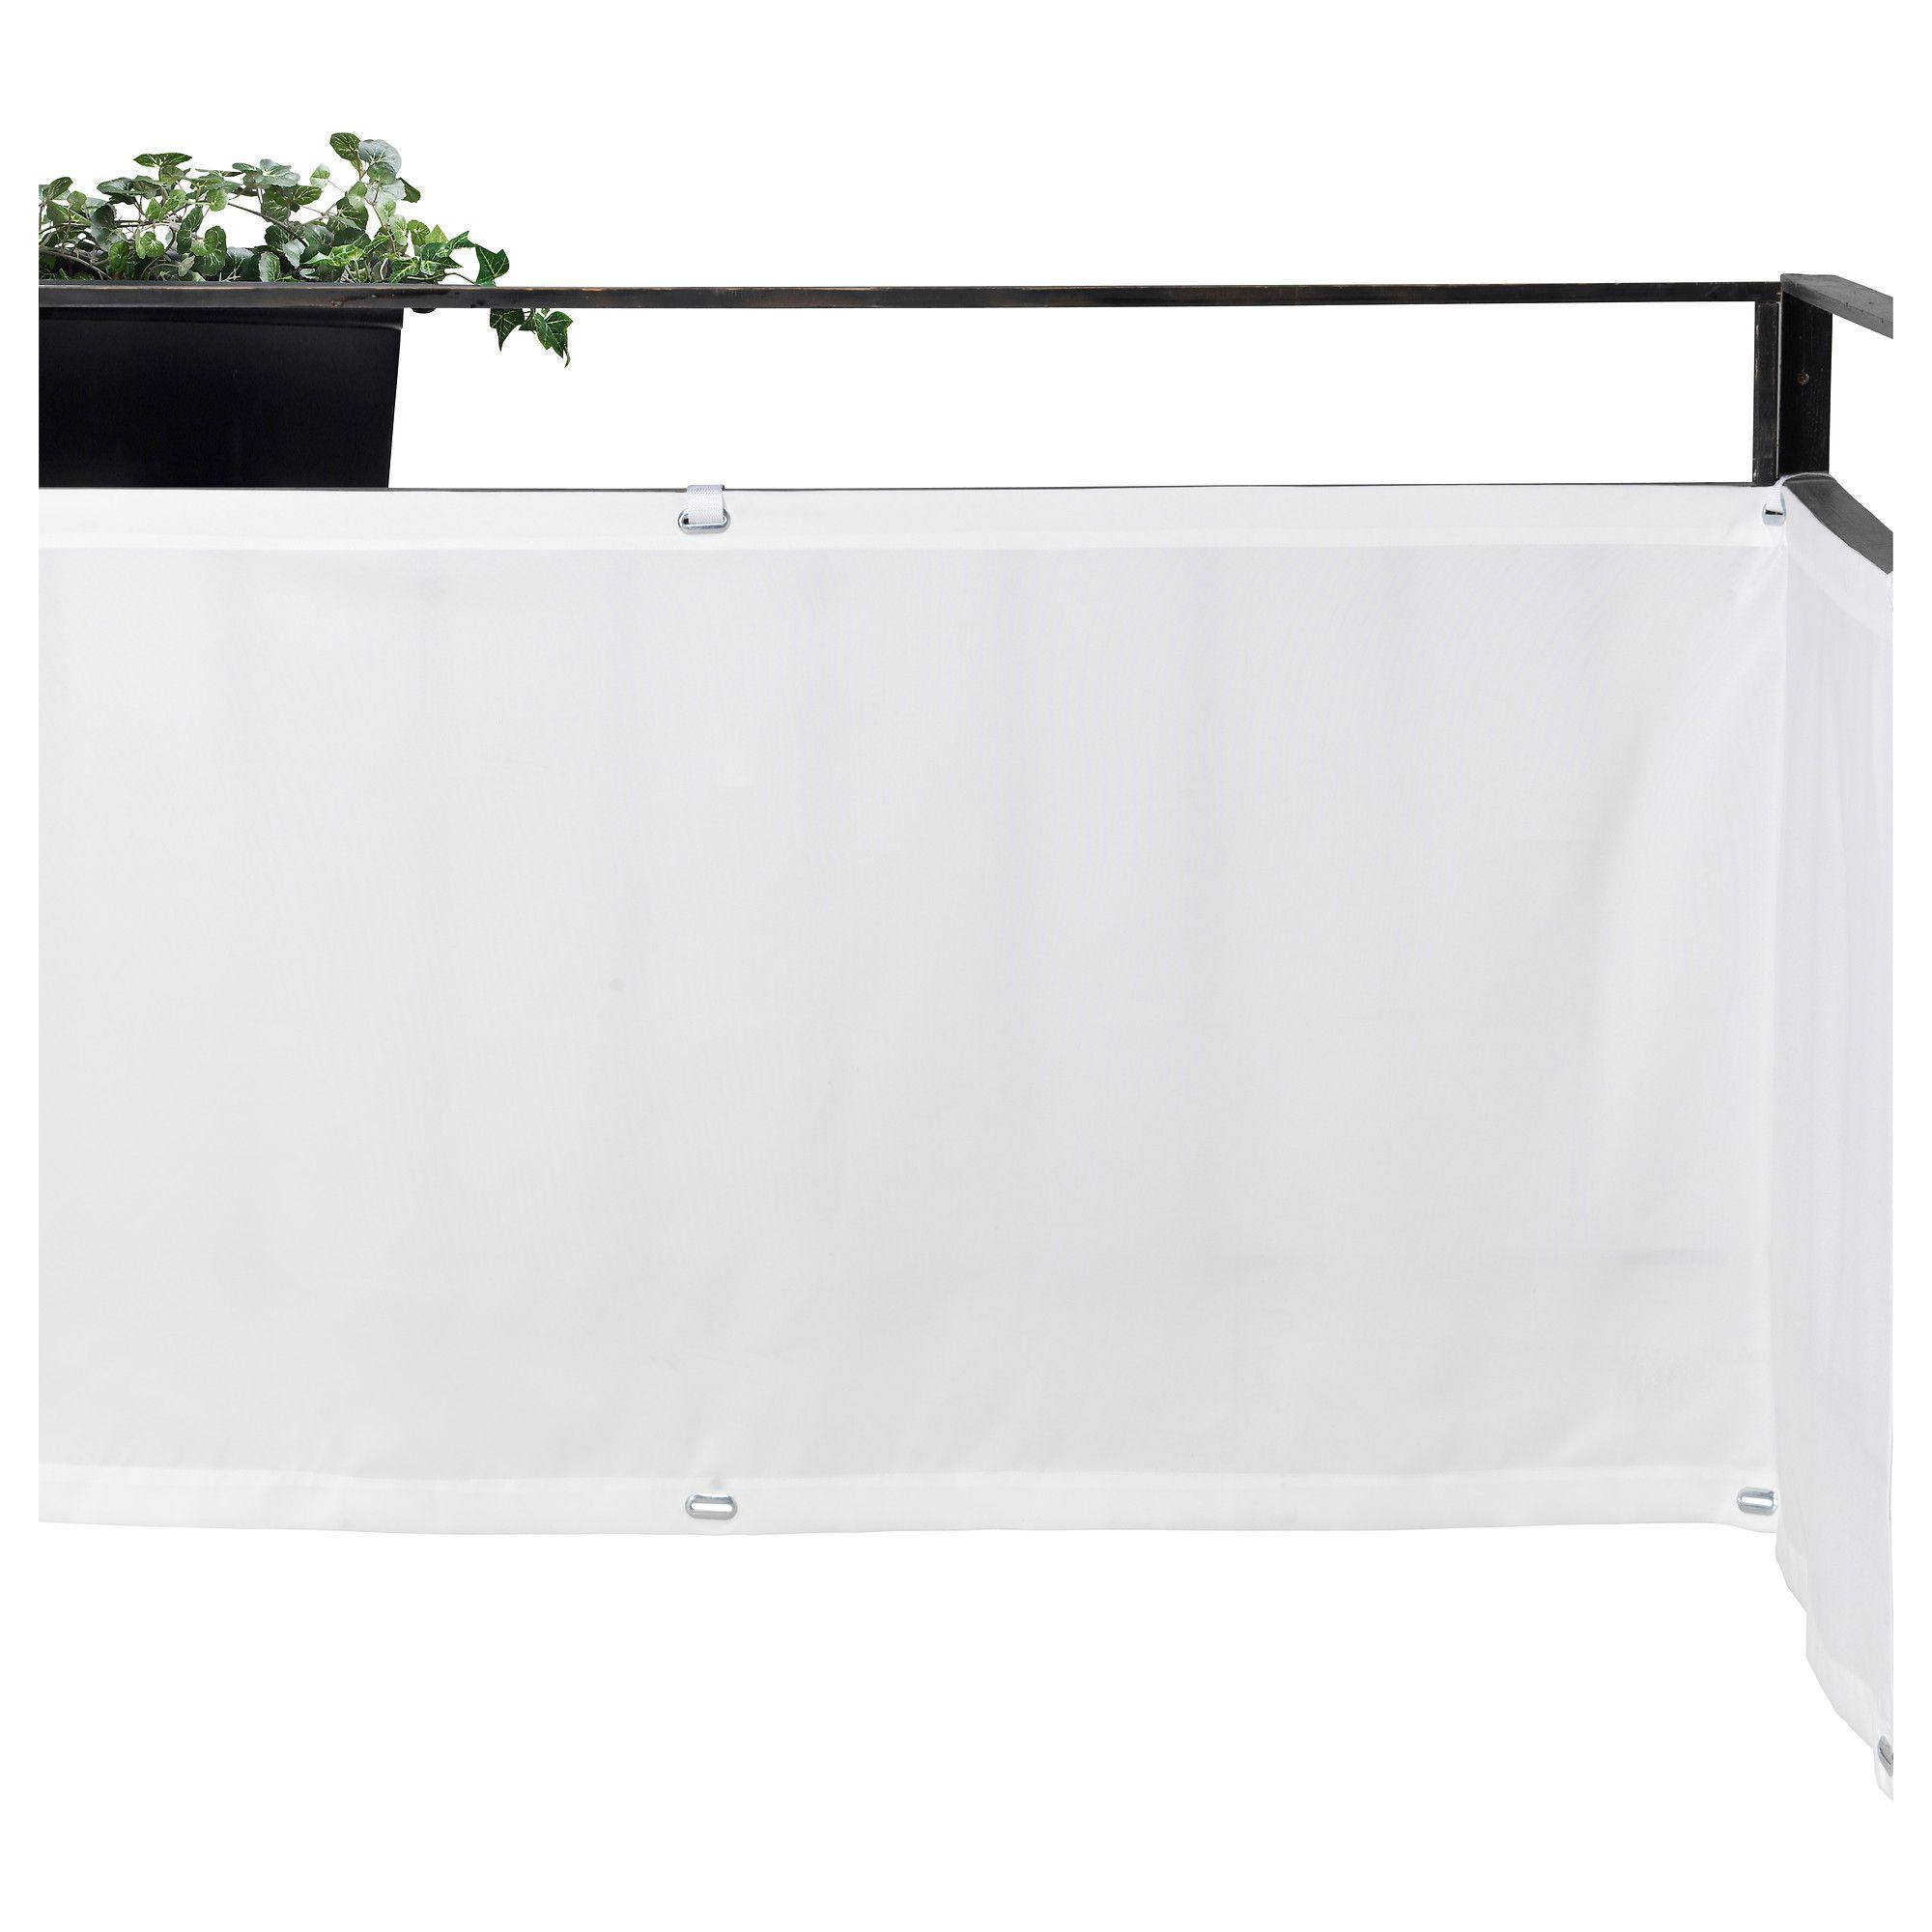 Ikea Sonnenschutz dyning wind sonnenschutz weiß ikea balkony